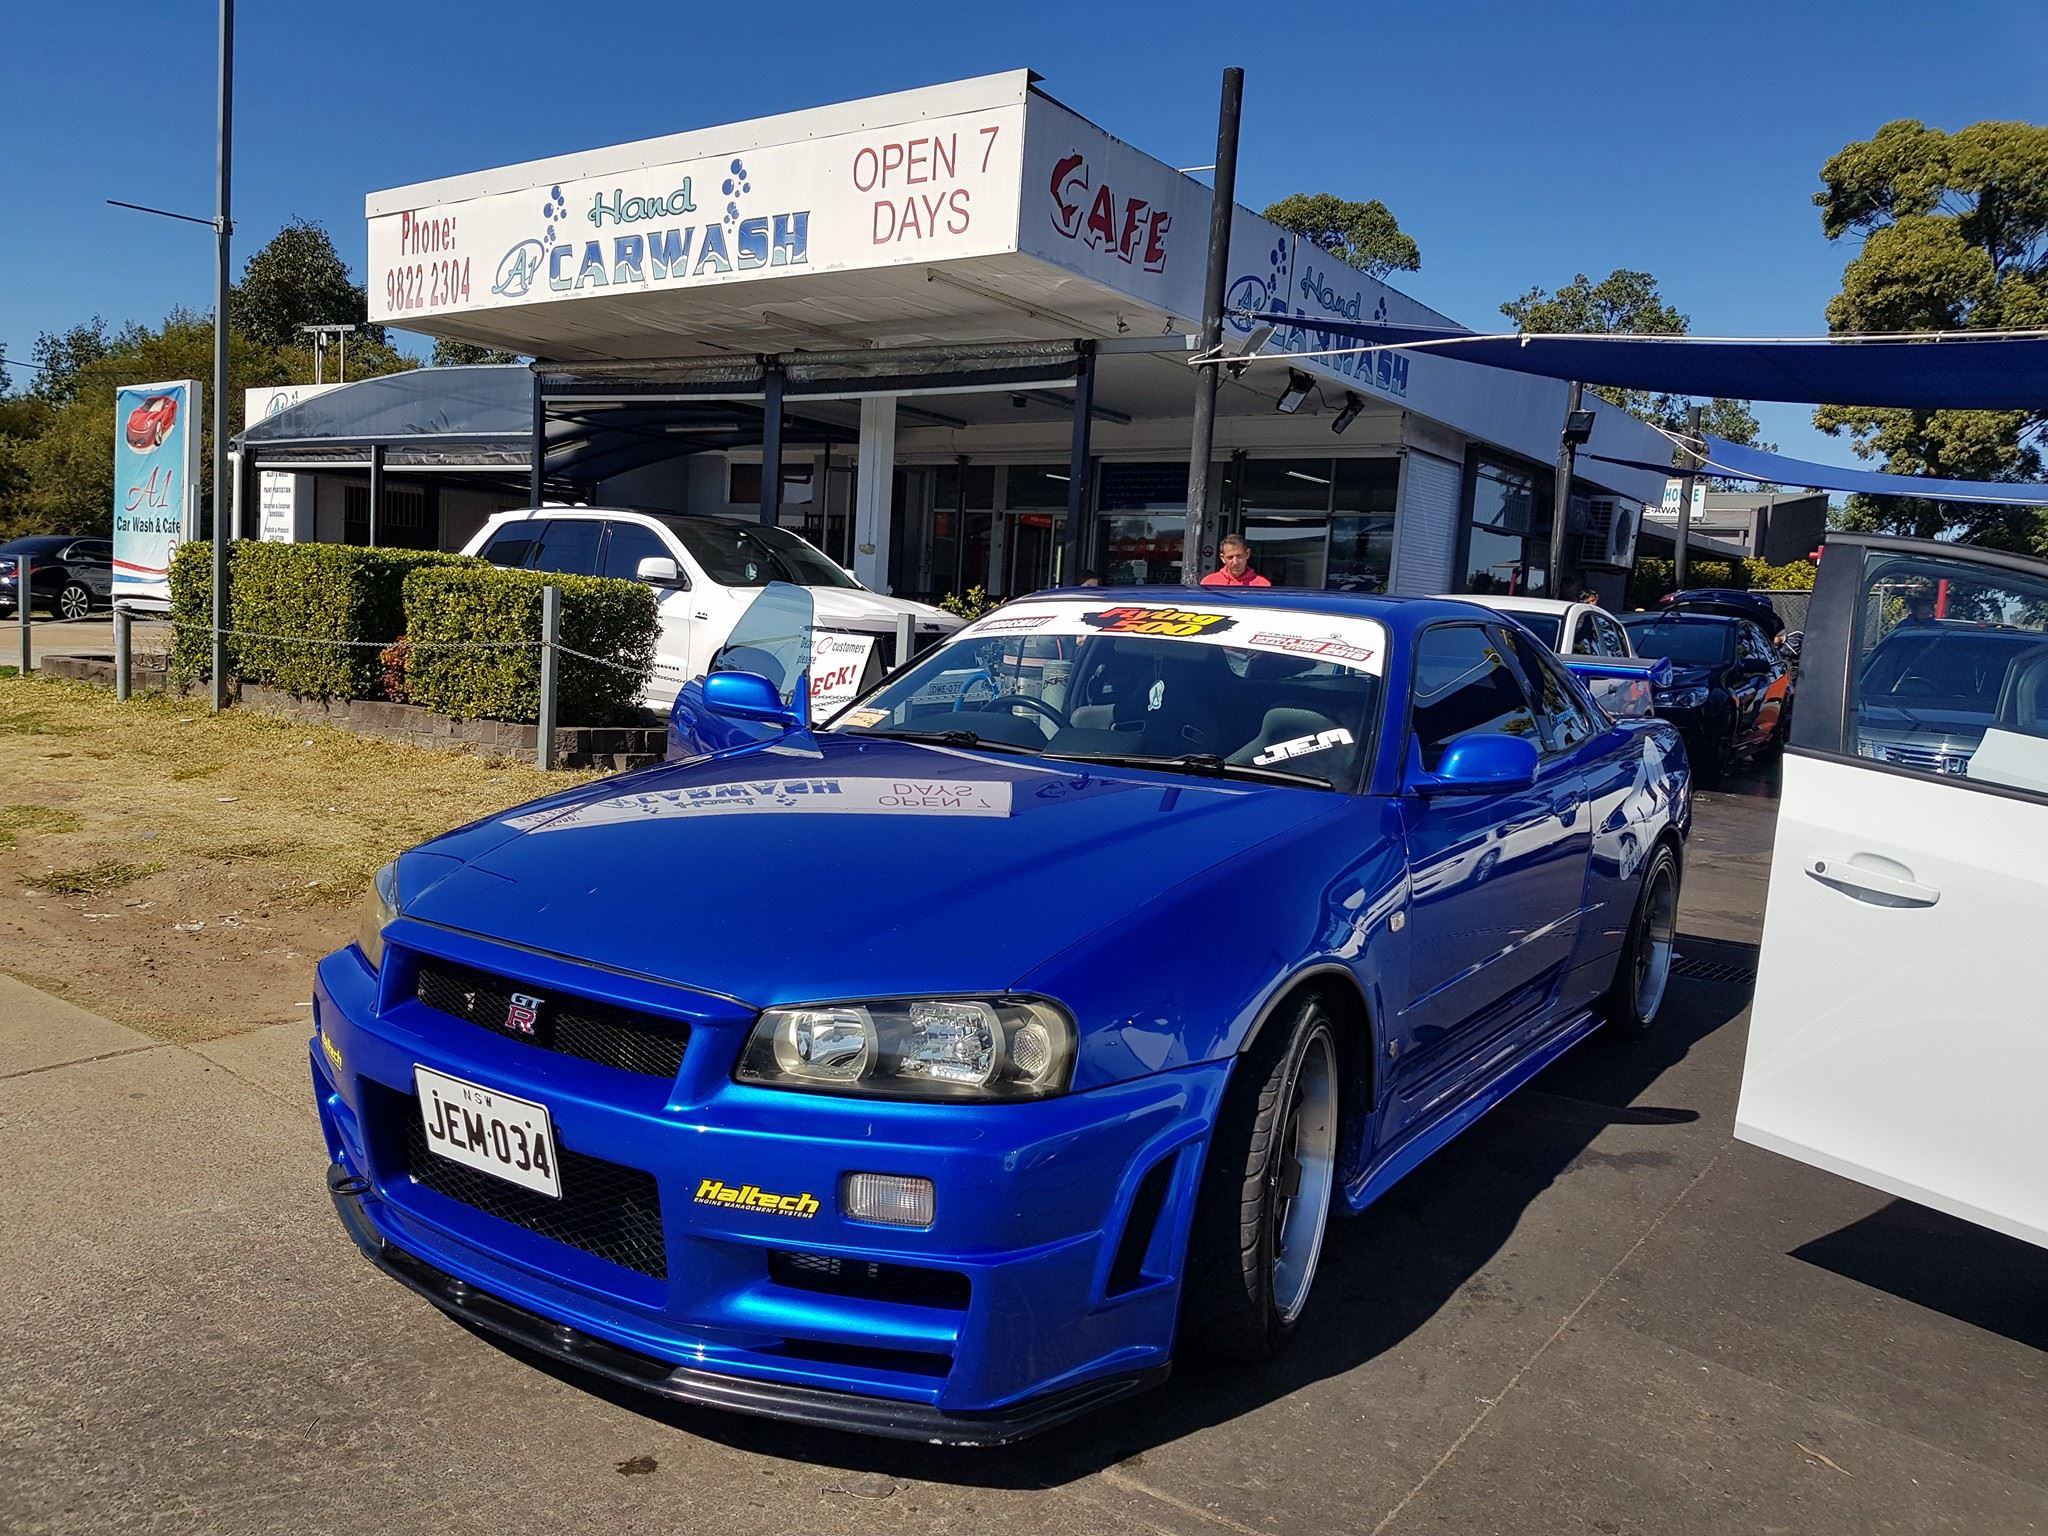 JEM R43 GTR